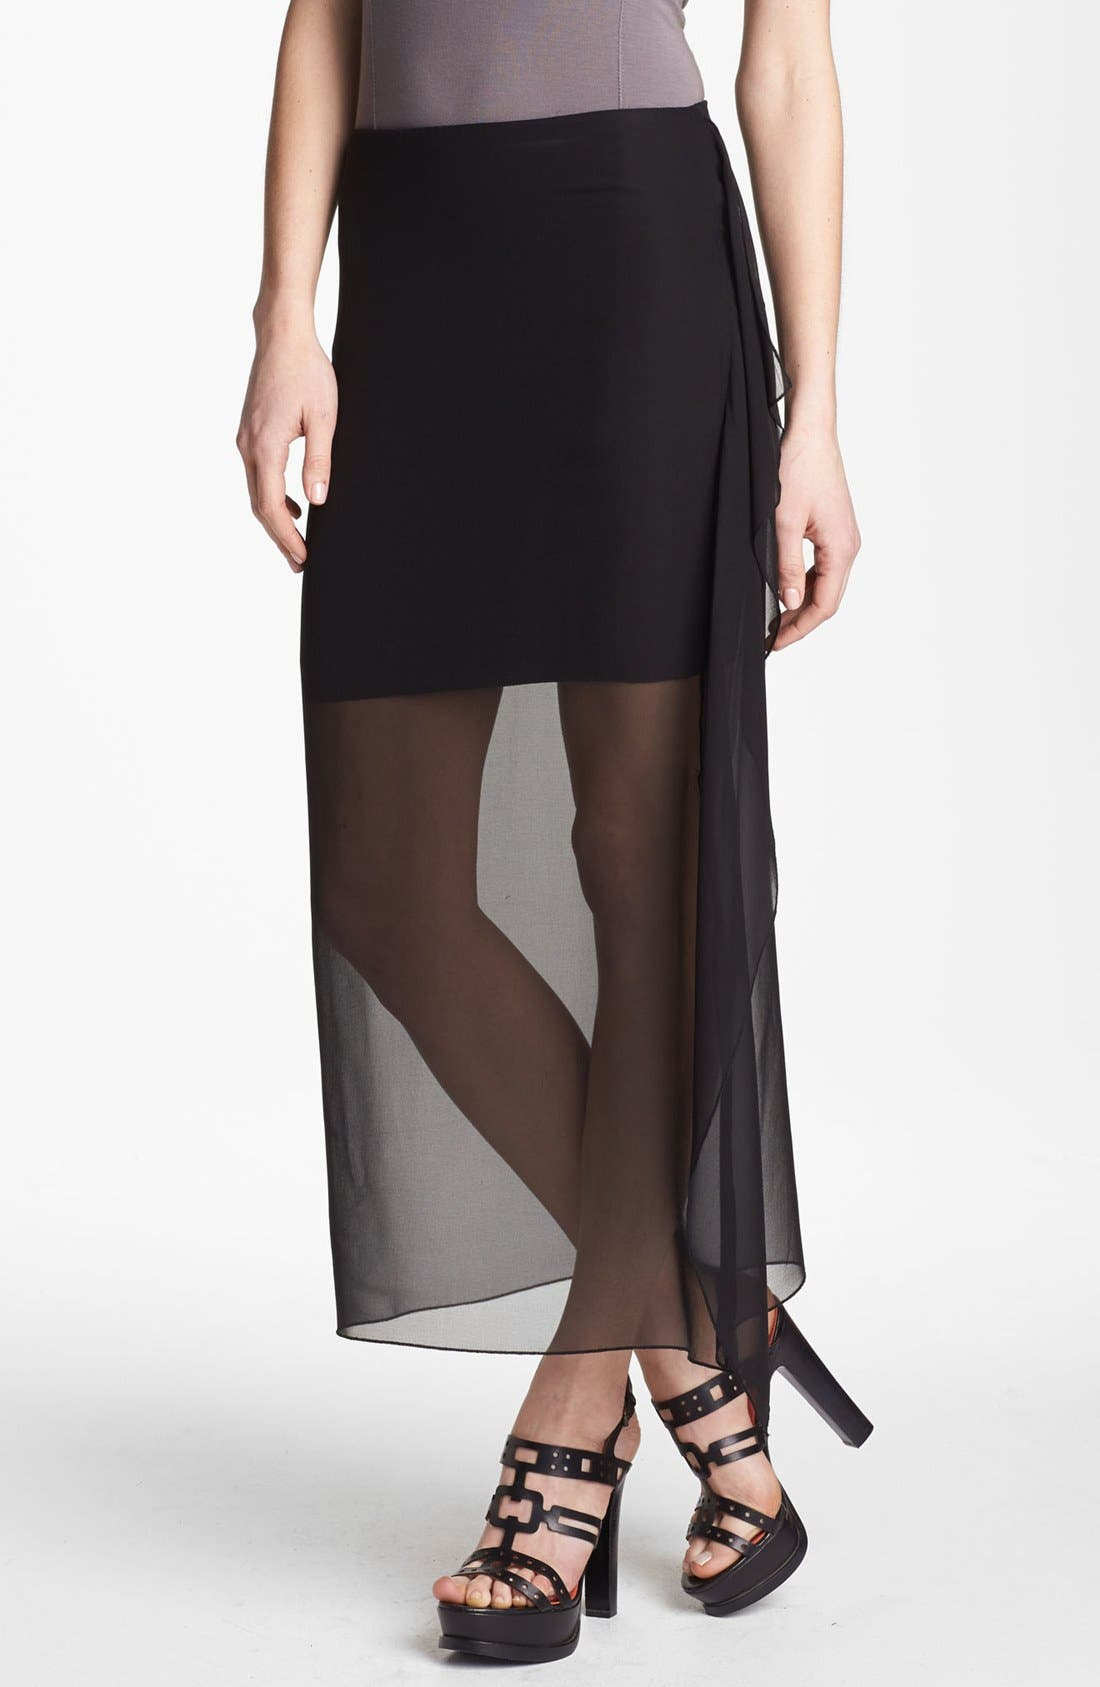 Alternate Image 1 Selected - Bailey 44 'Sea Grass' Sheer Overlay Skirt